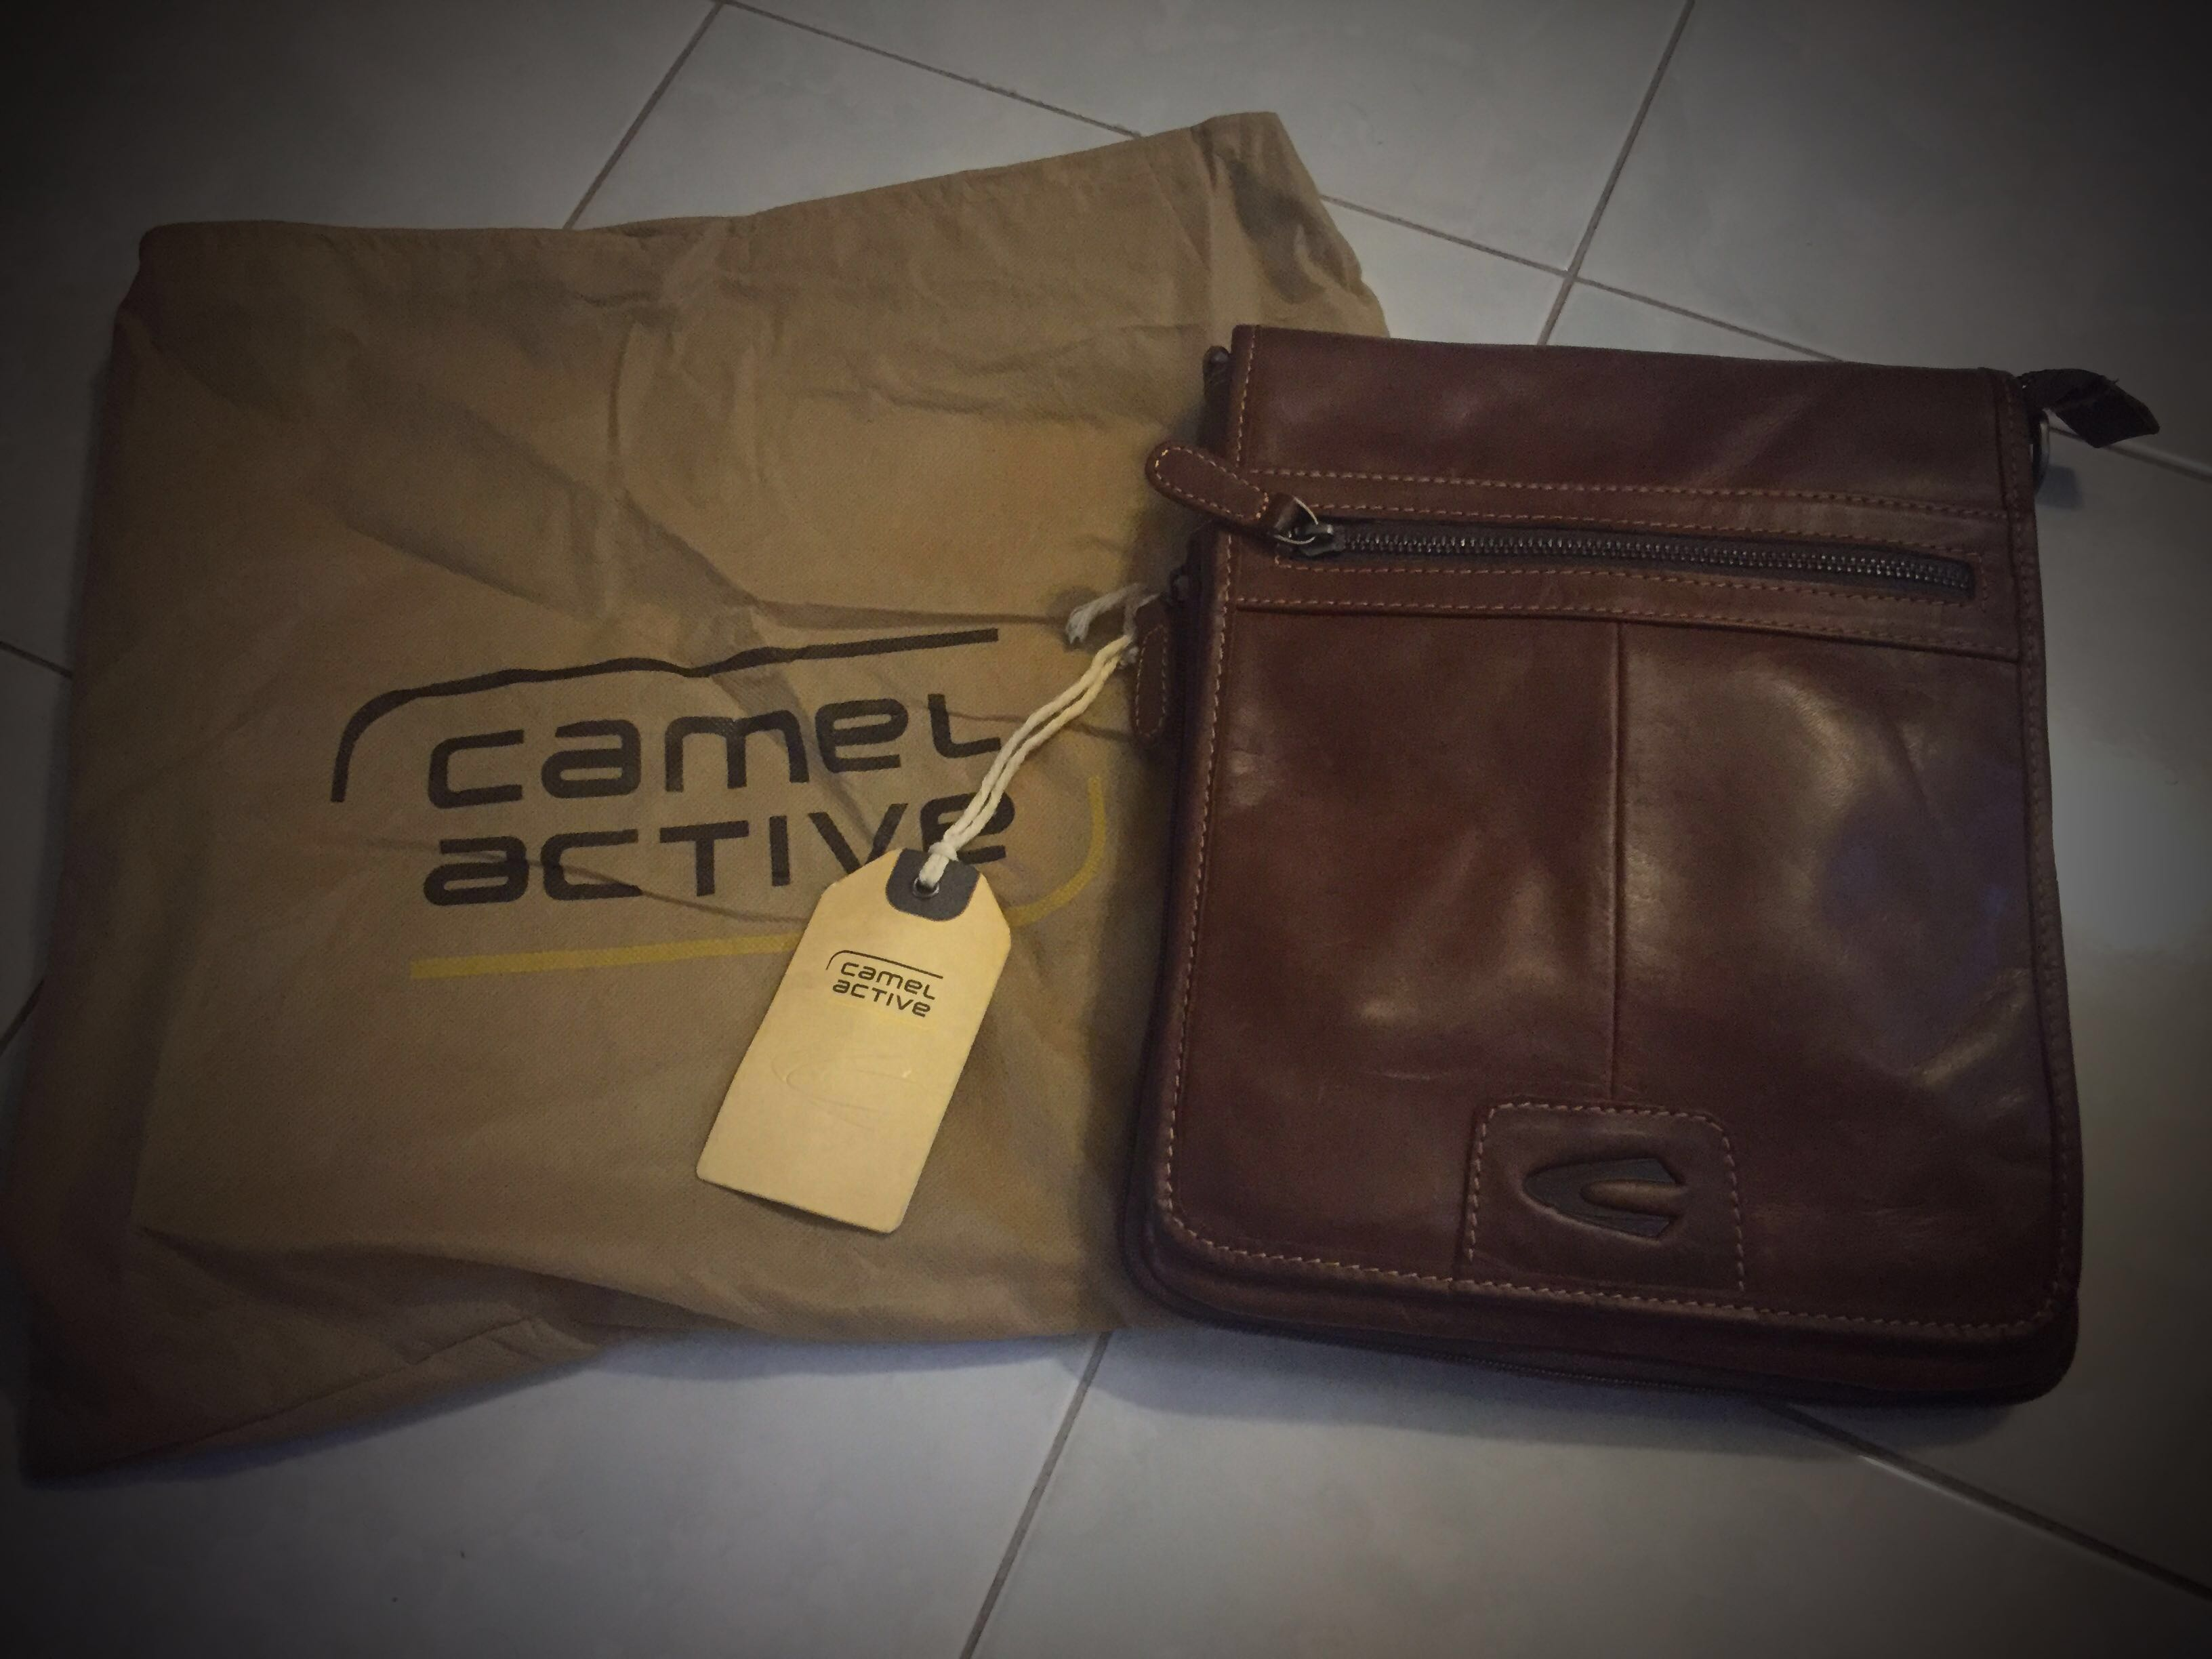 Camel active leather sling bag 1cc3d026f9